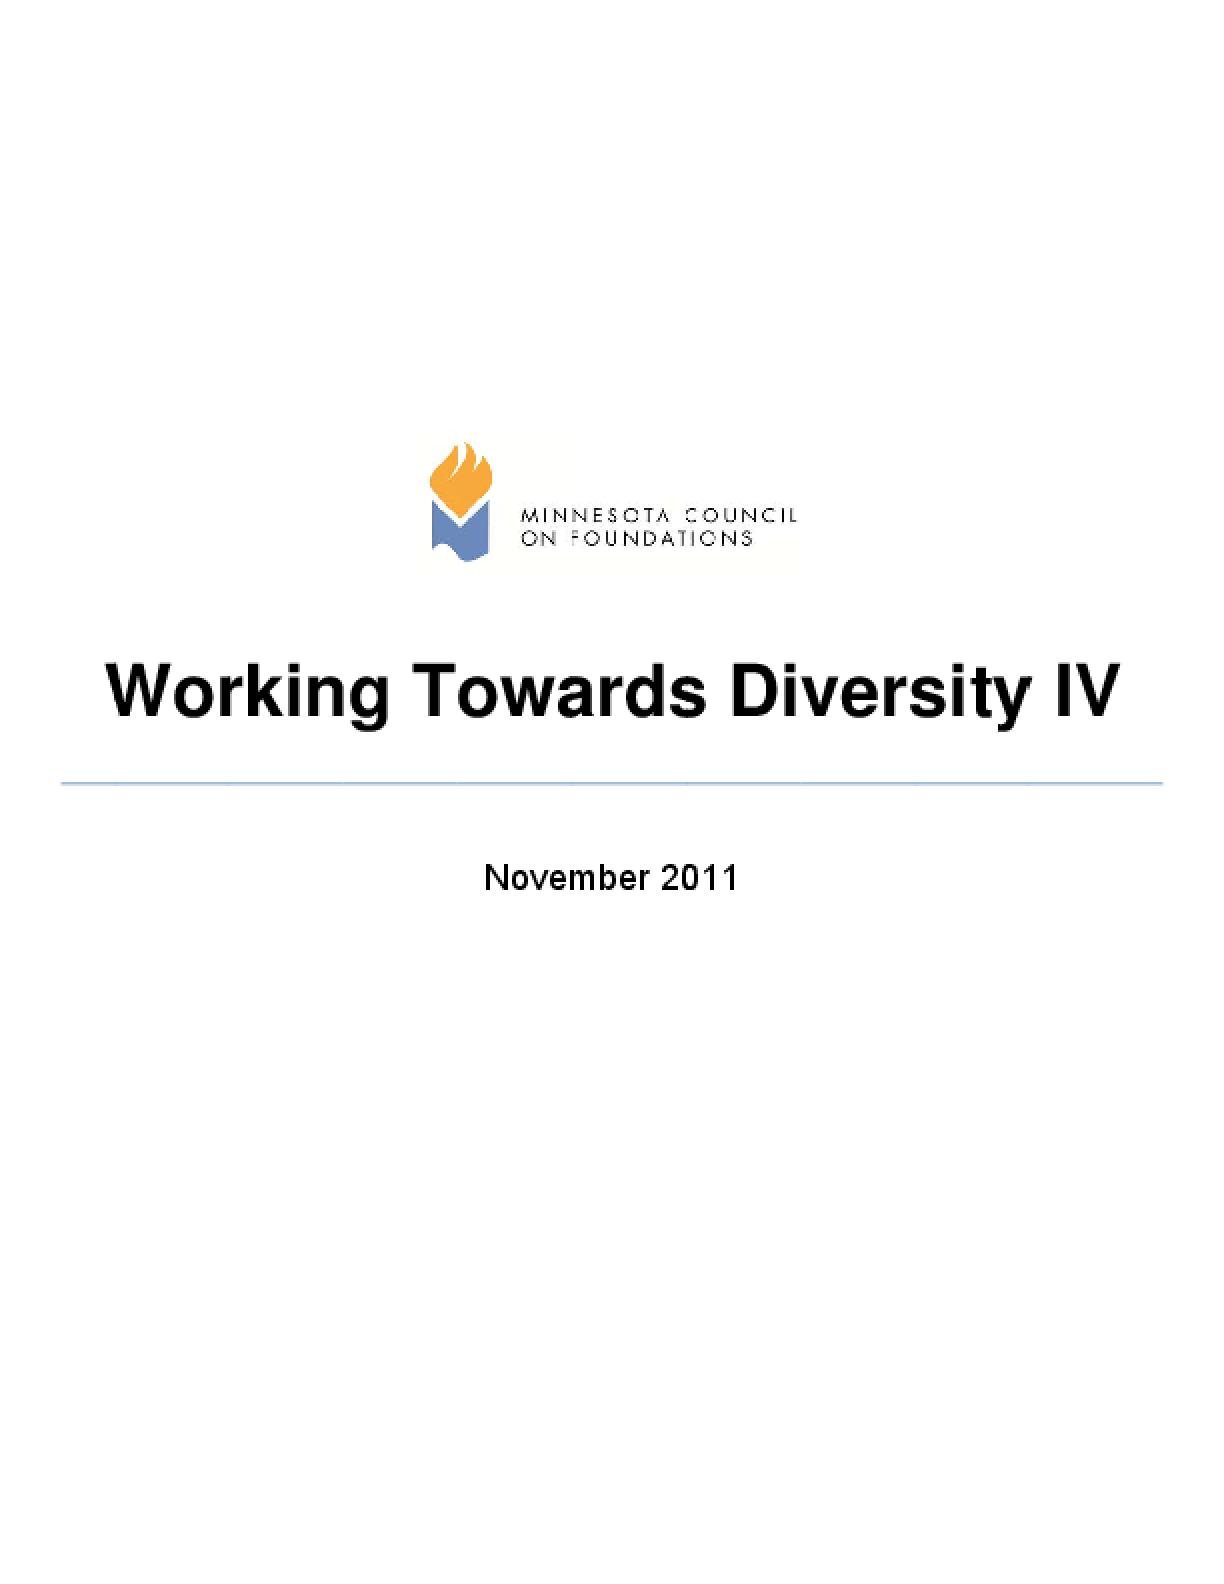 Working Towards Diversity IV